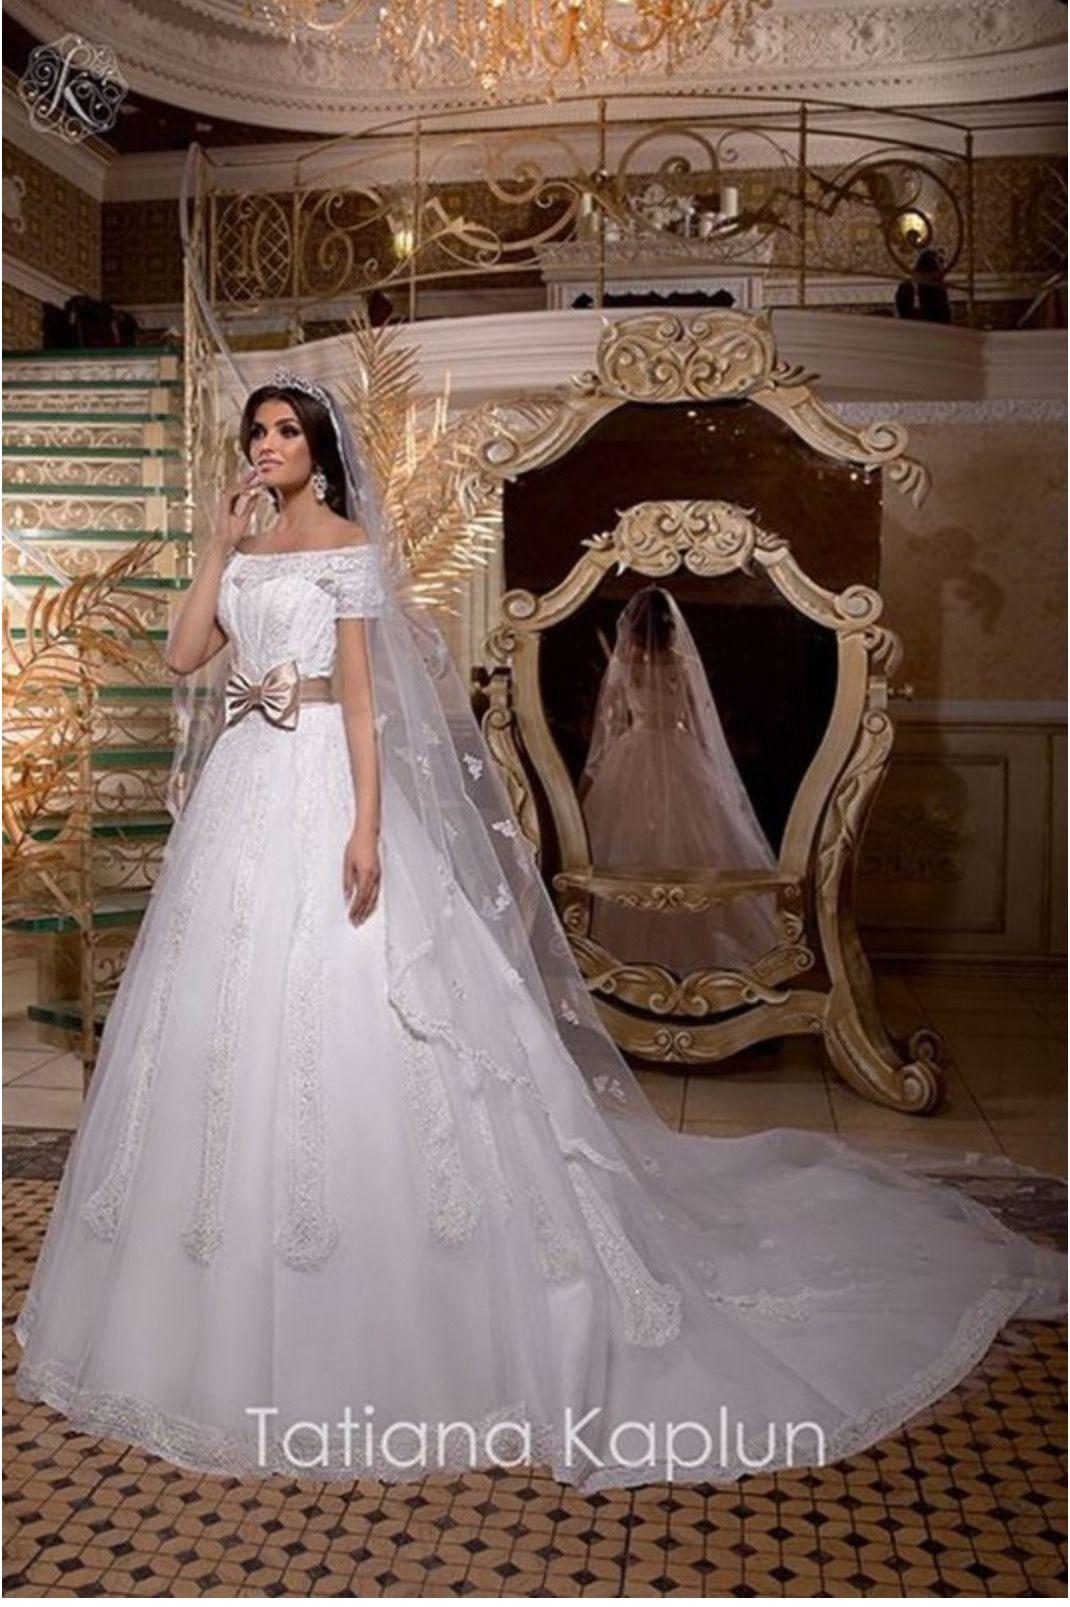 Pin by Regina Denton on Bridal | Pinterest | Wedding dress and Wedding